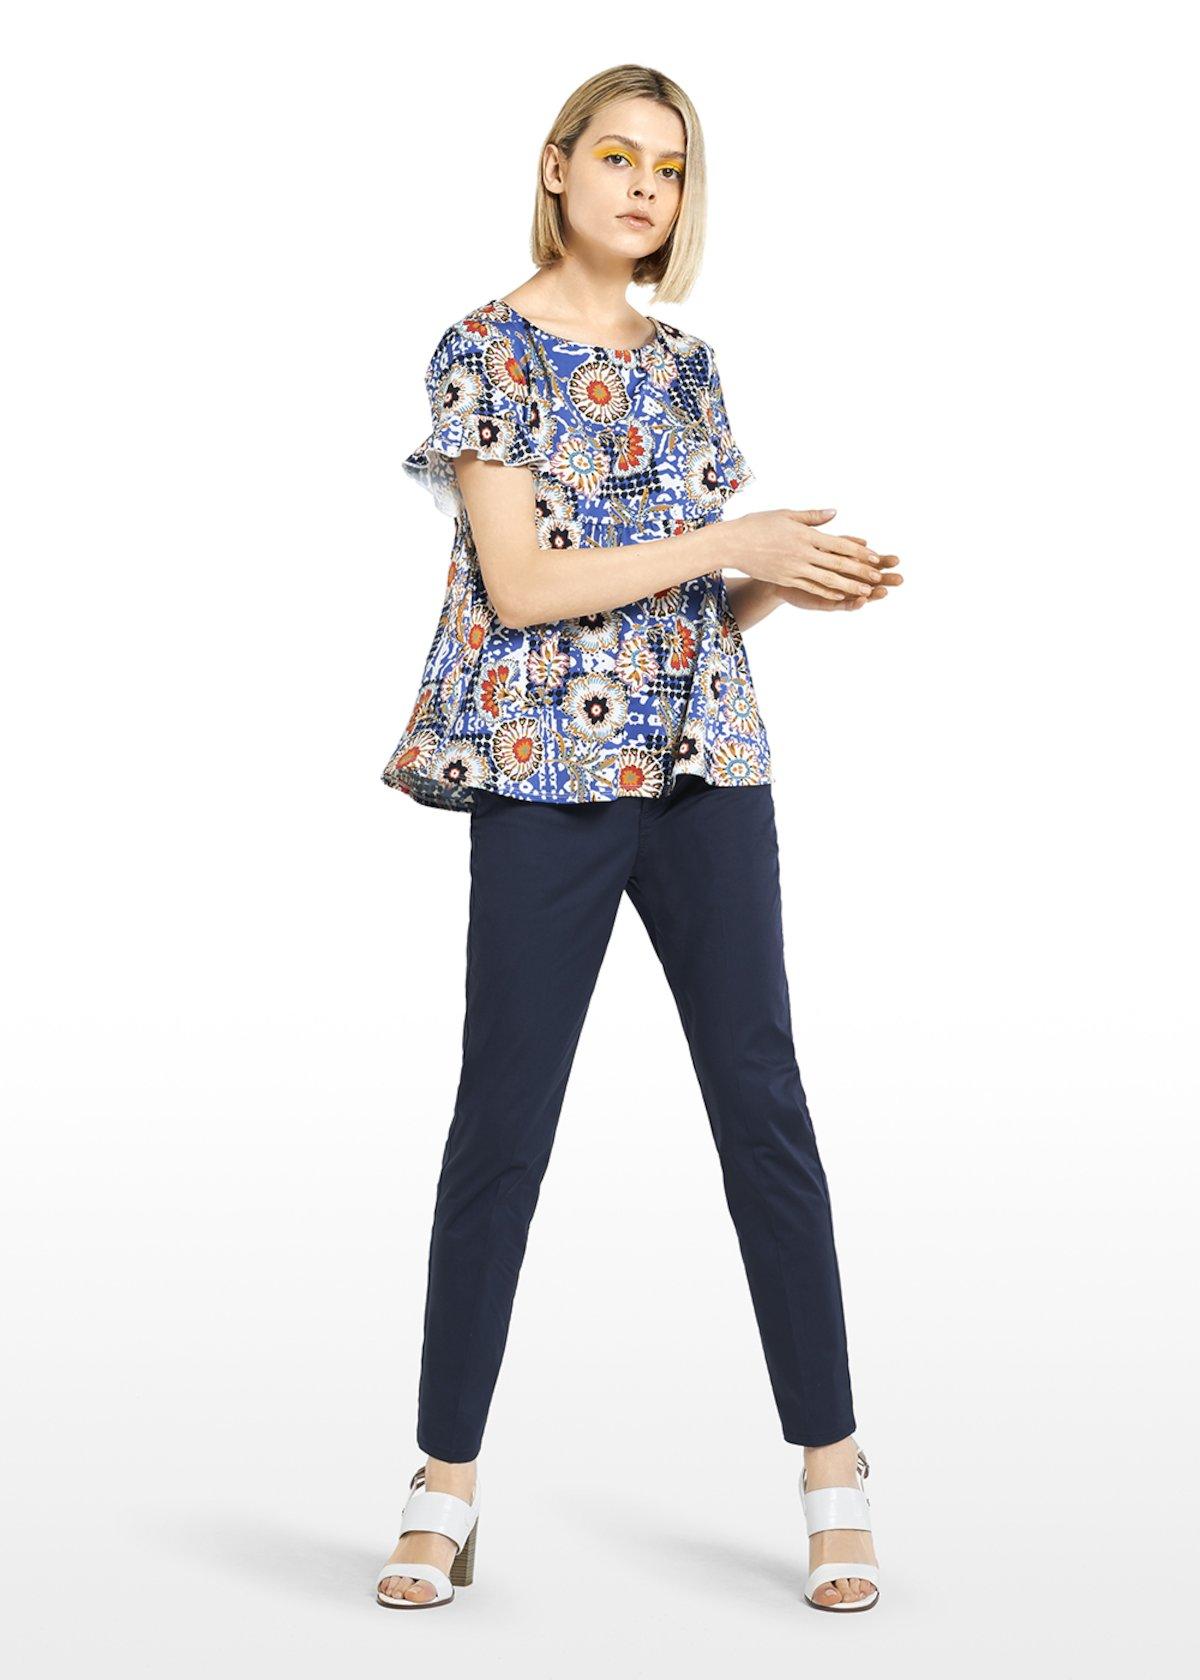 Susi t-shirt with Ankara print and ruffles - Avion / White Fantasia - Woman - Category image